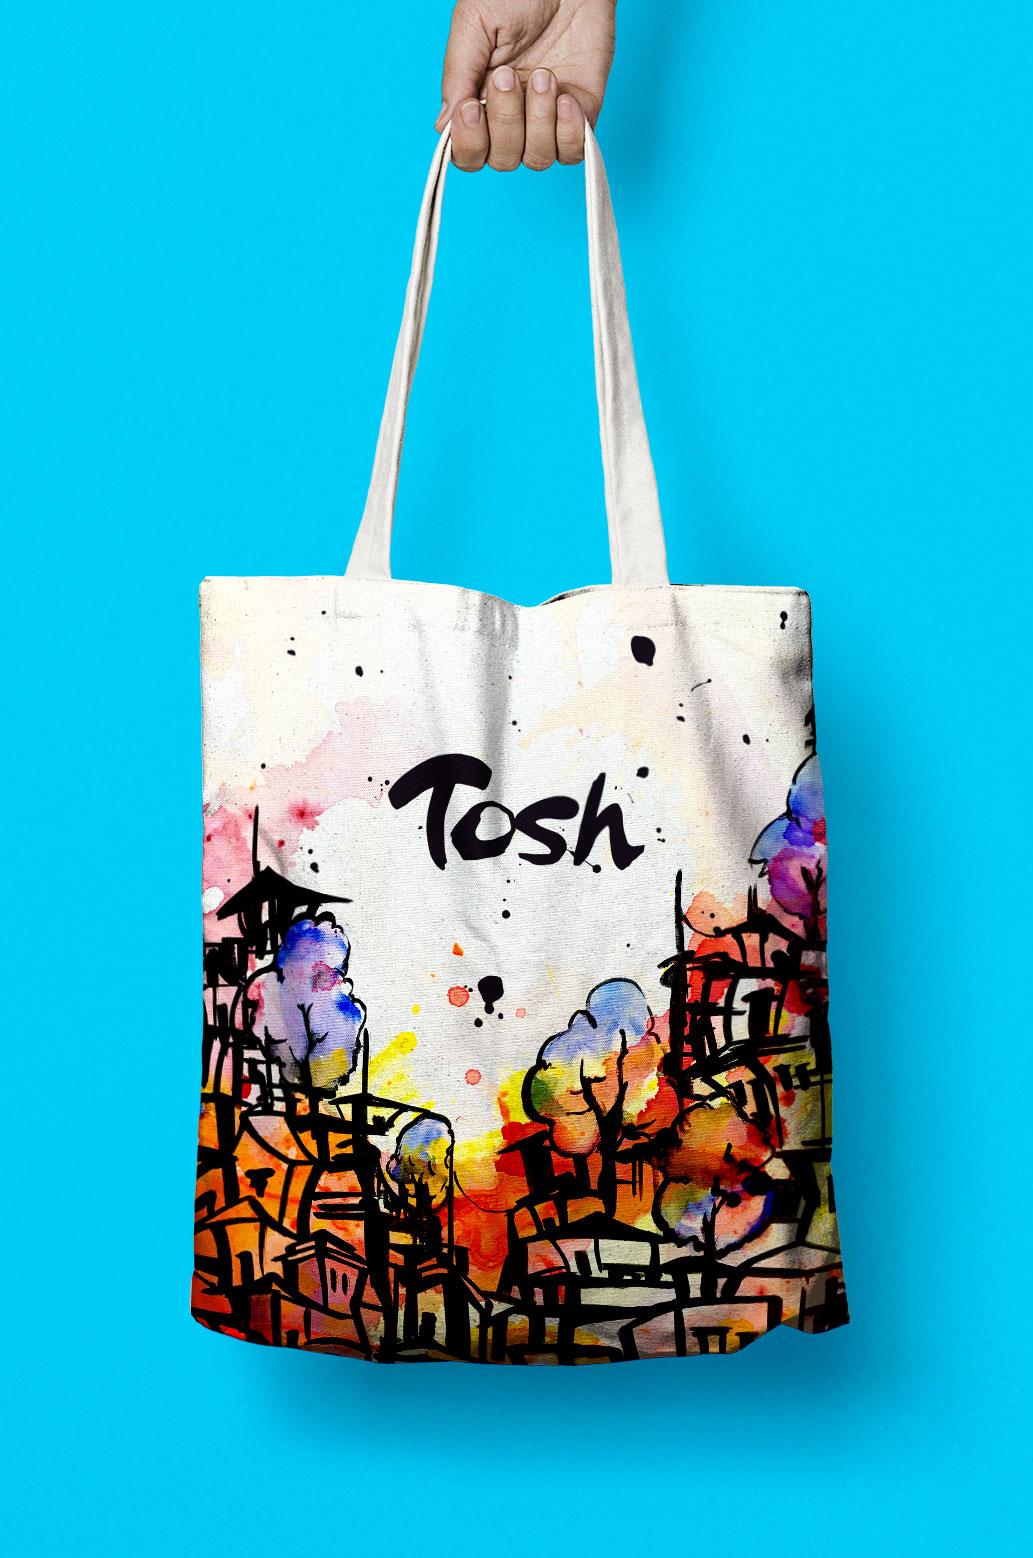 Tosh Jeffrey Tote Bag Design by Furia